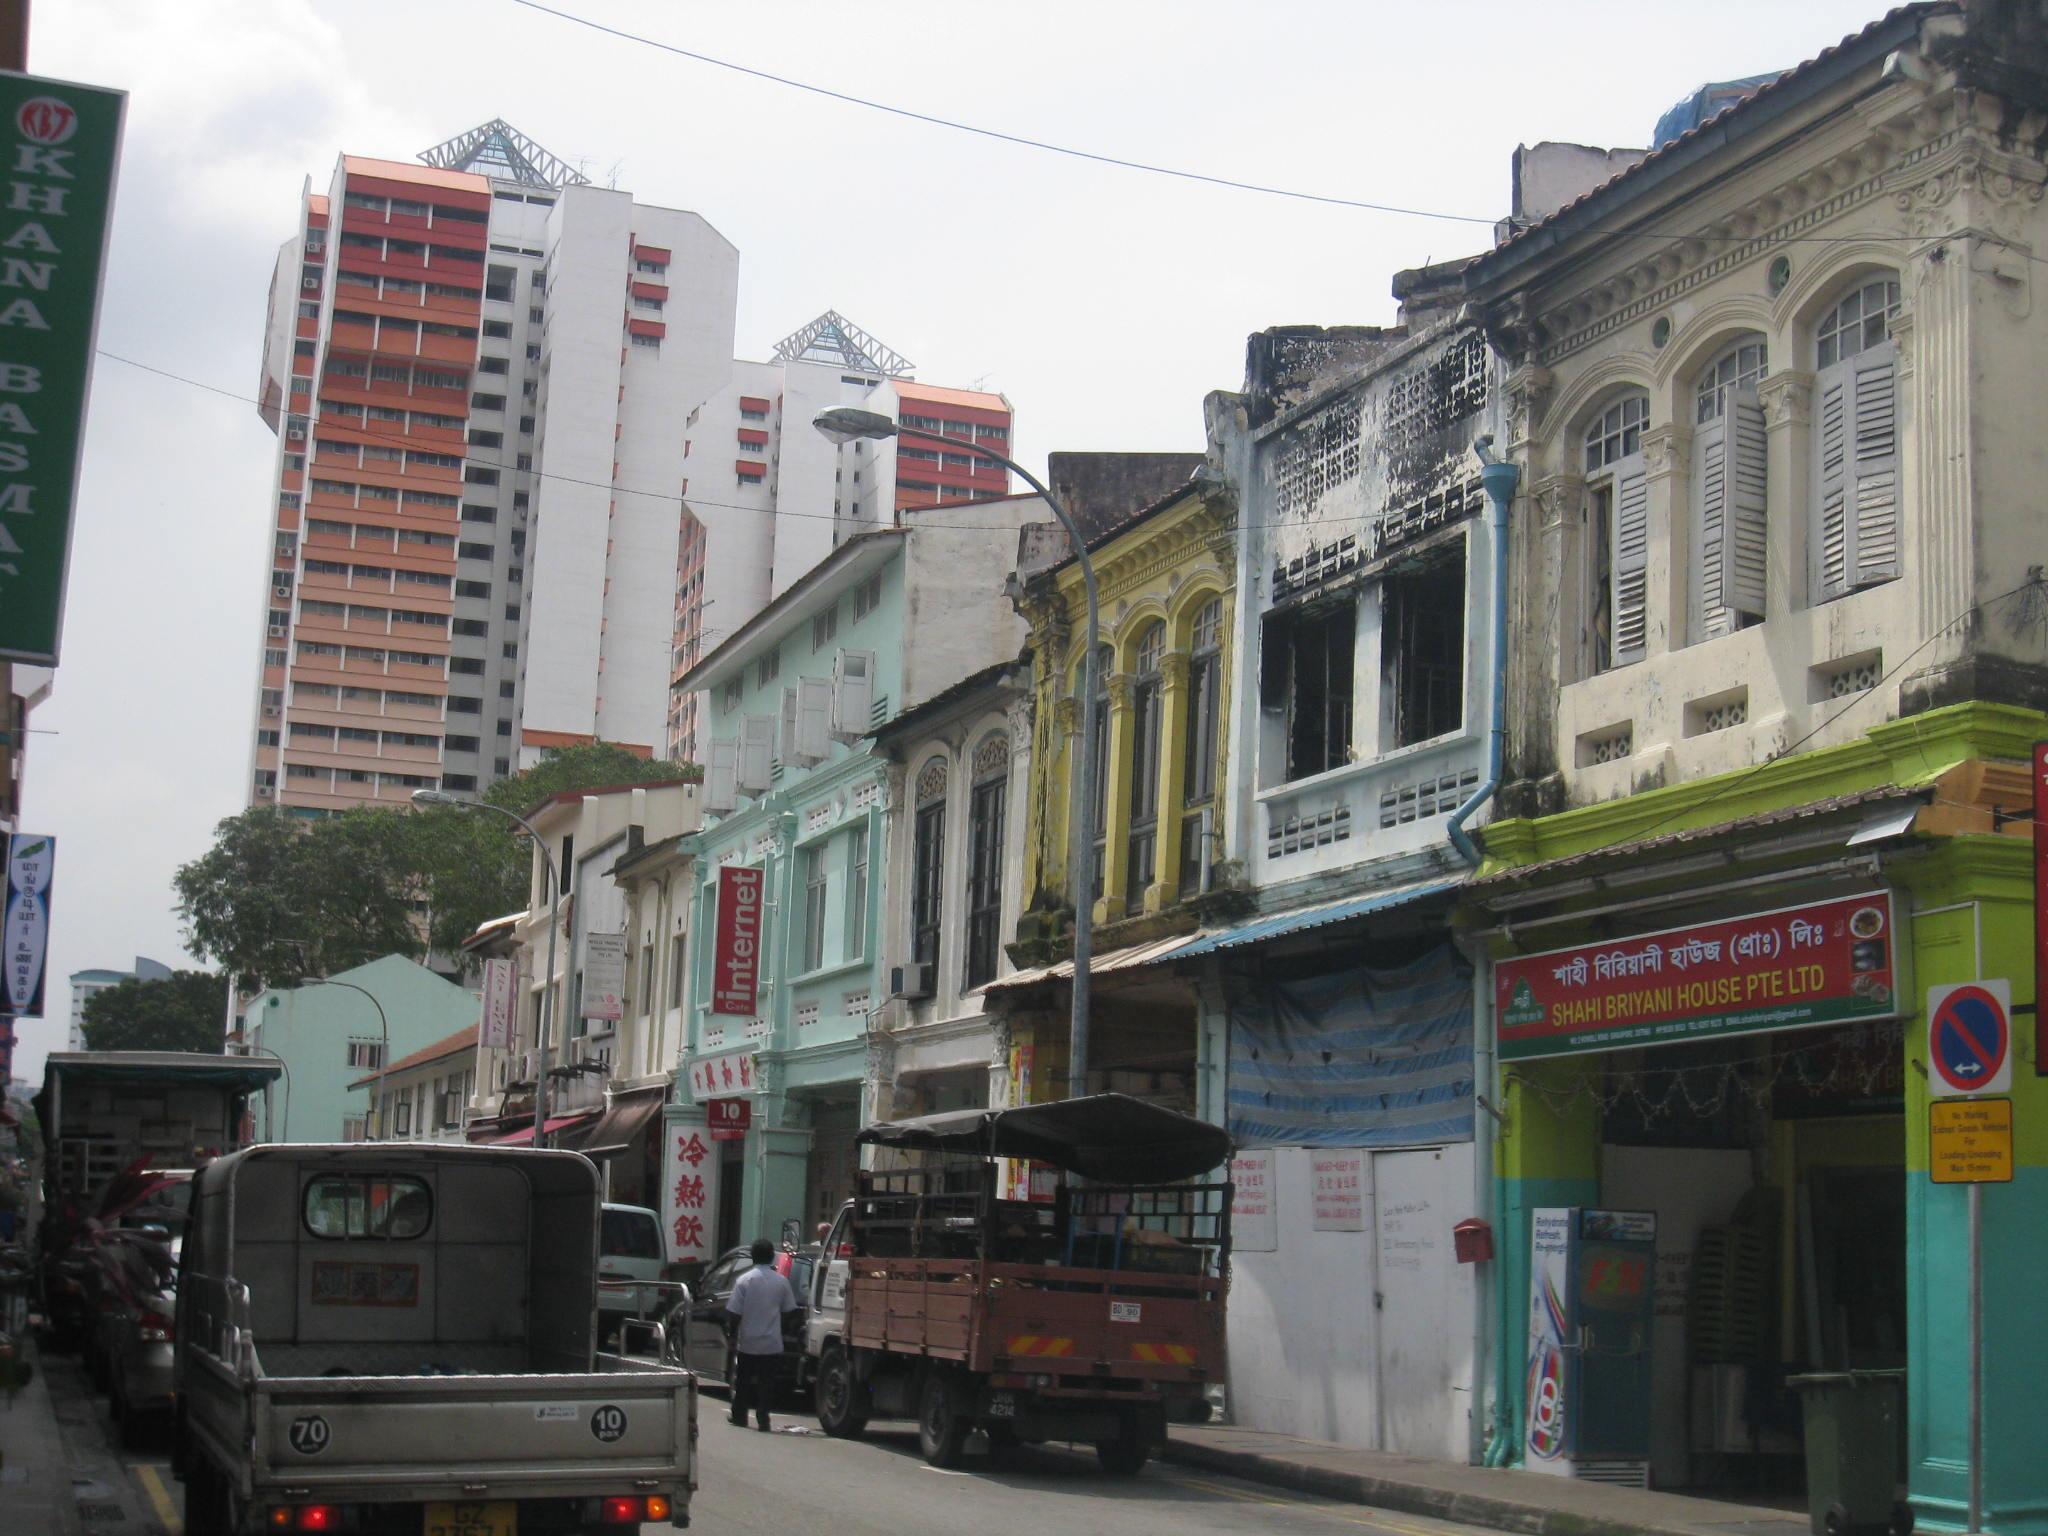 Singapore Little India でお買い物_c0212604_662214.jpg